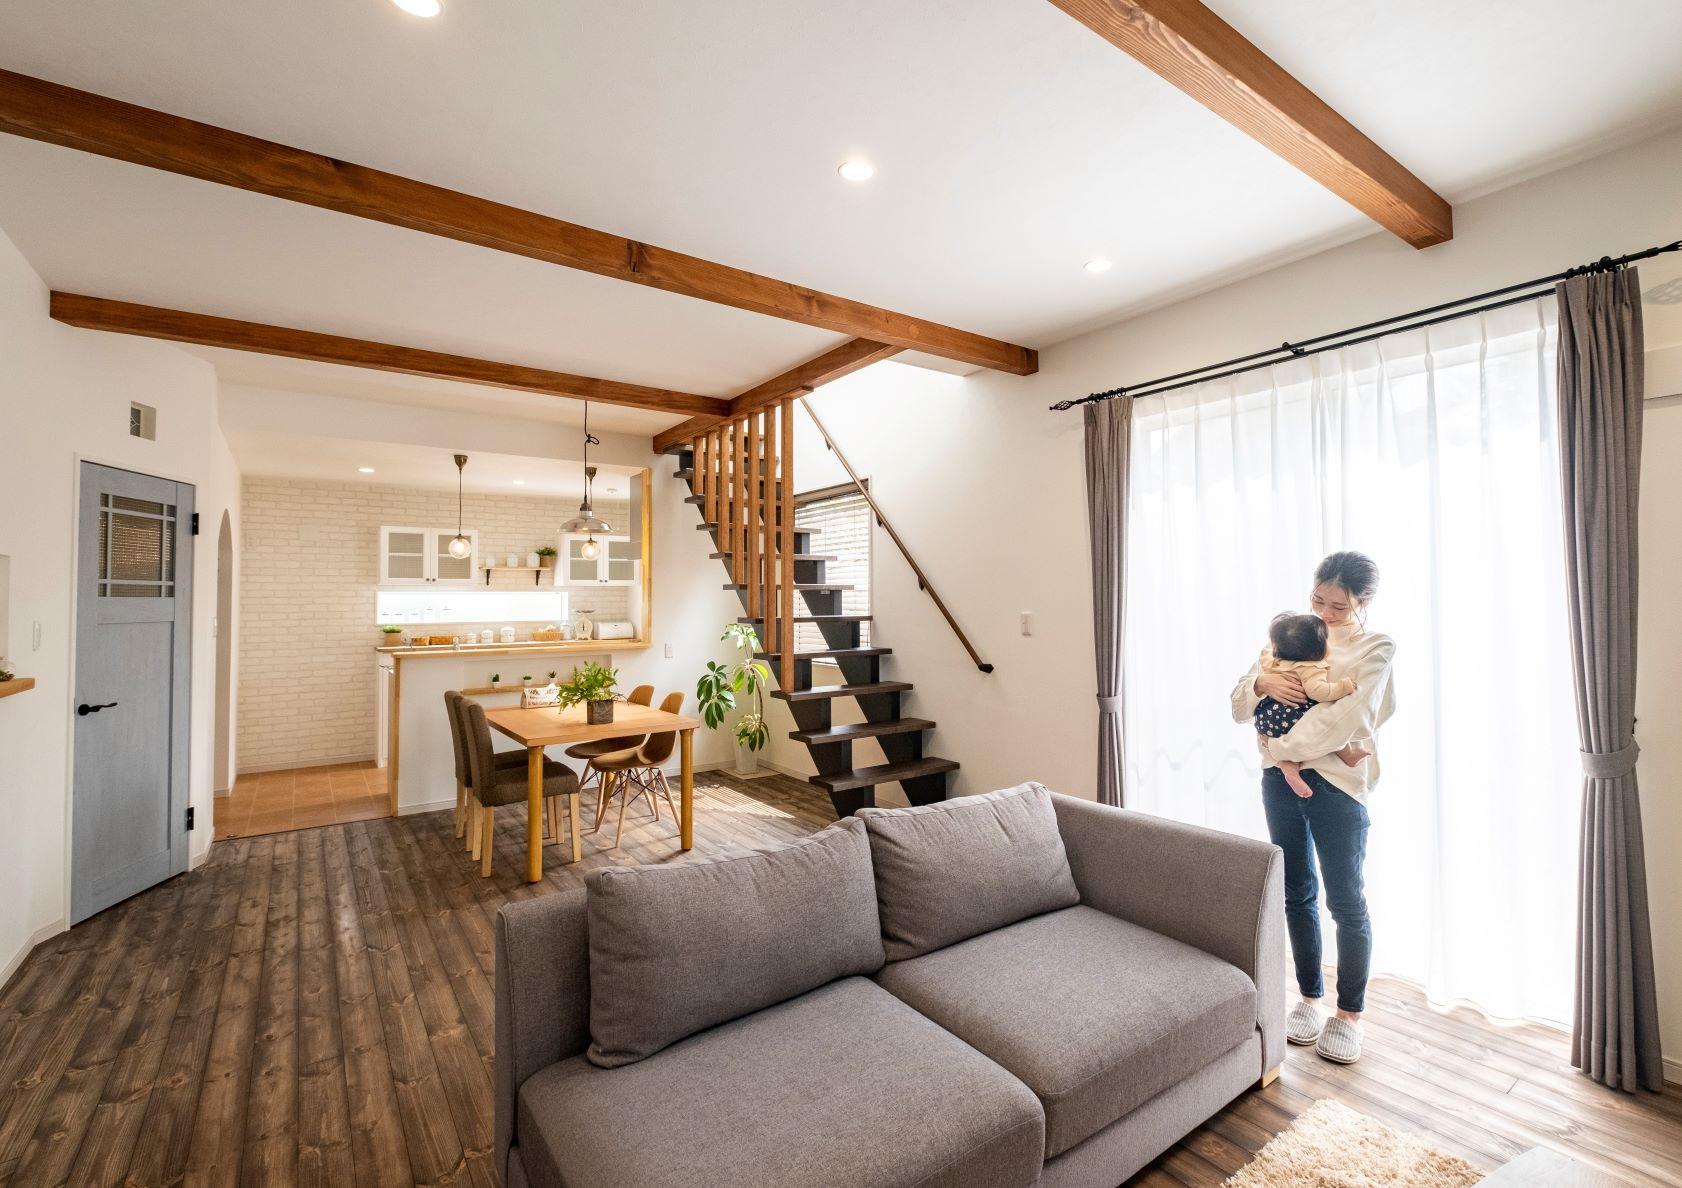 Art Wood Home (永建)のイメージ